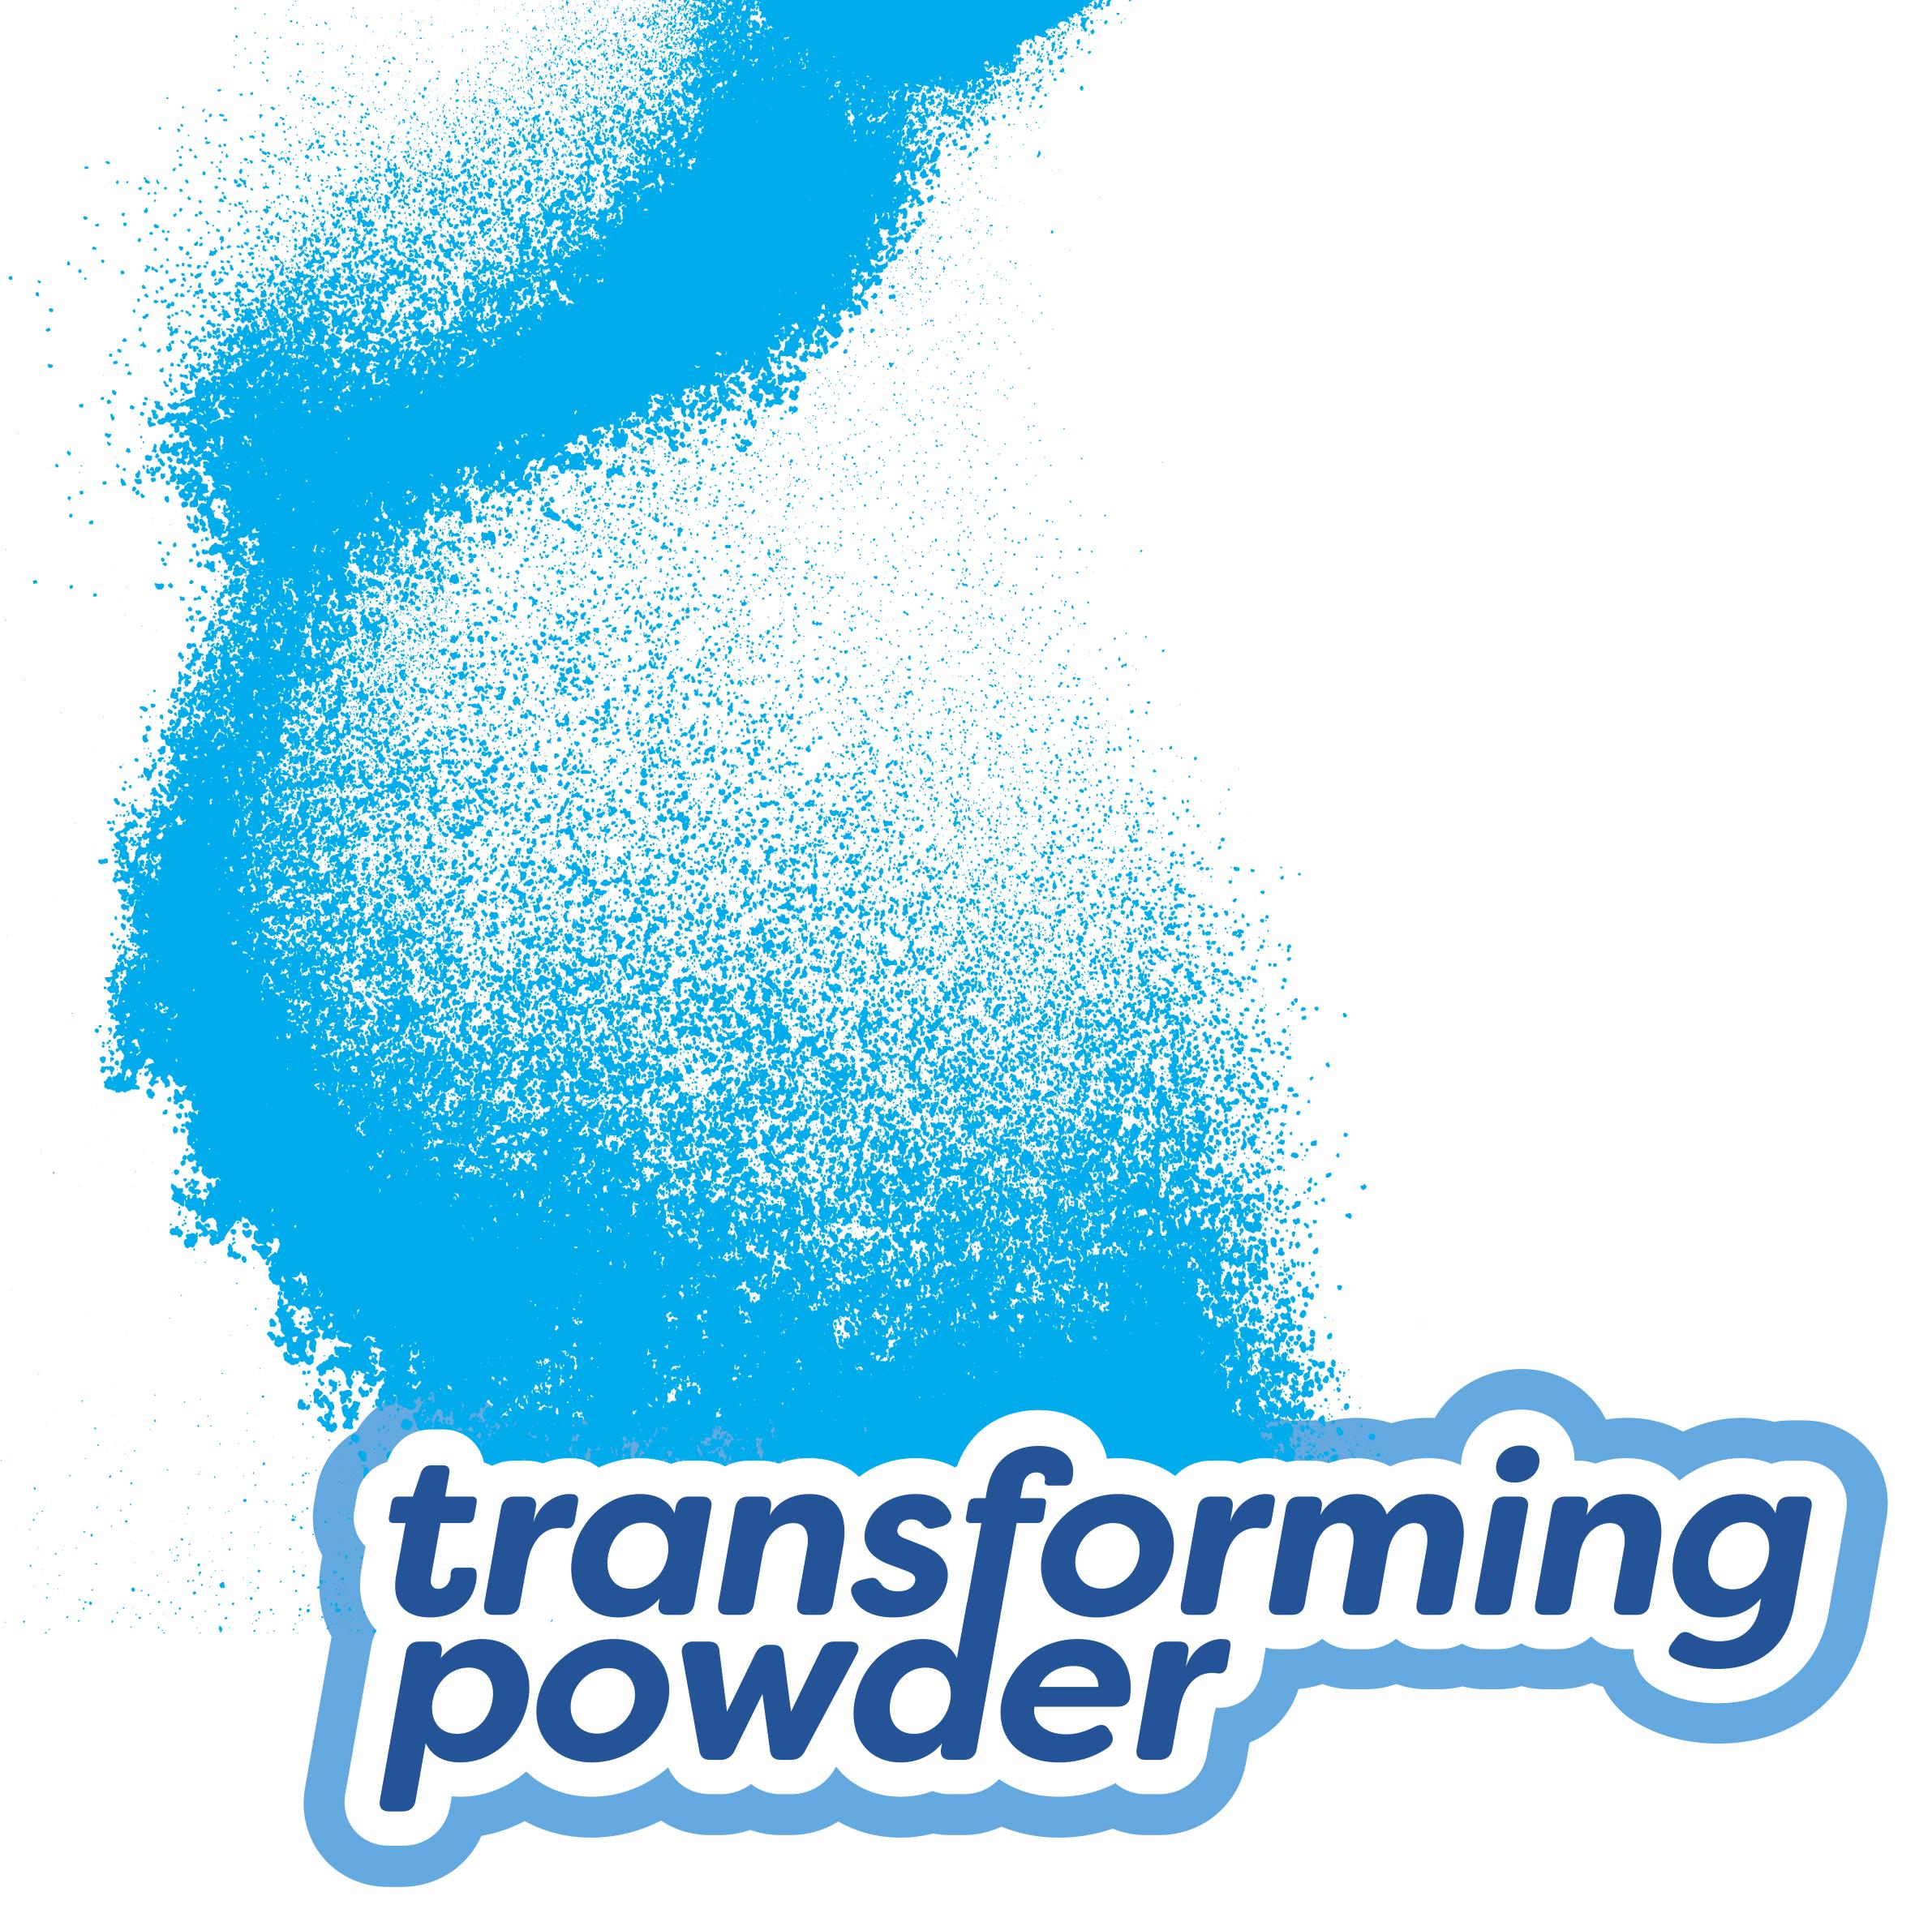 TRANSFORMING POWDER.jpg